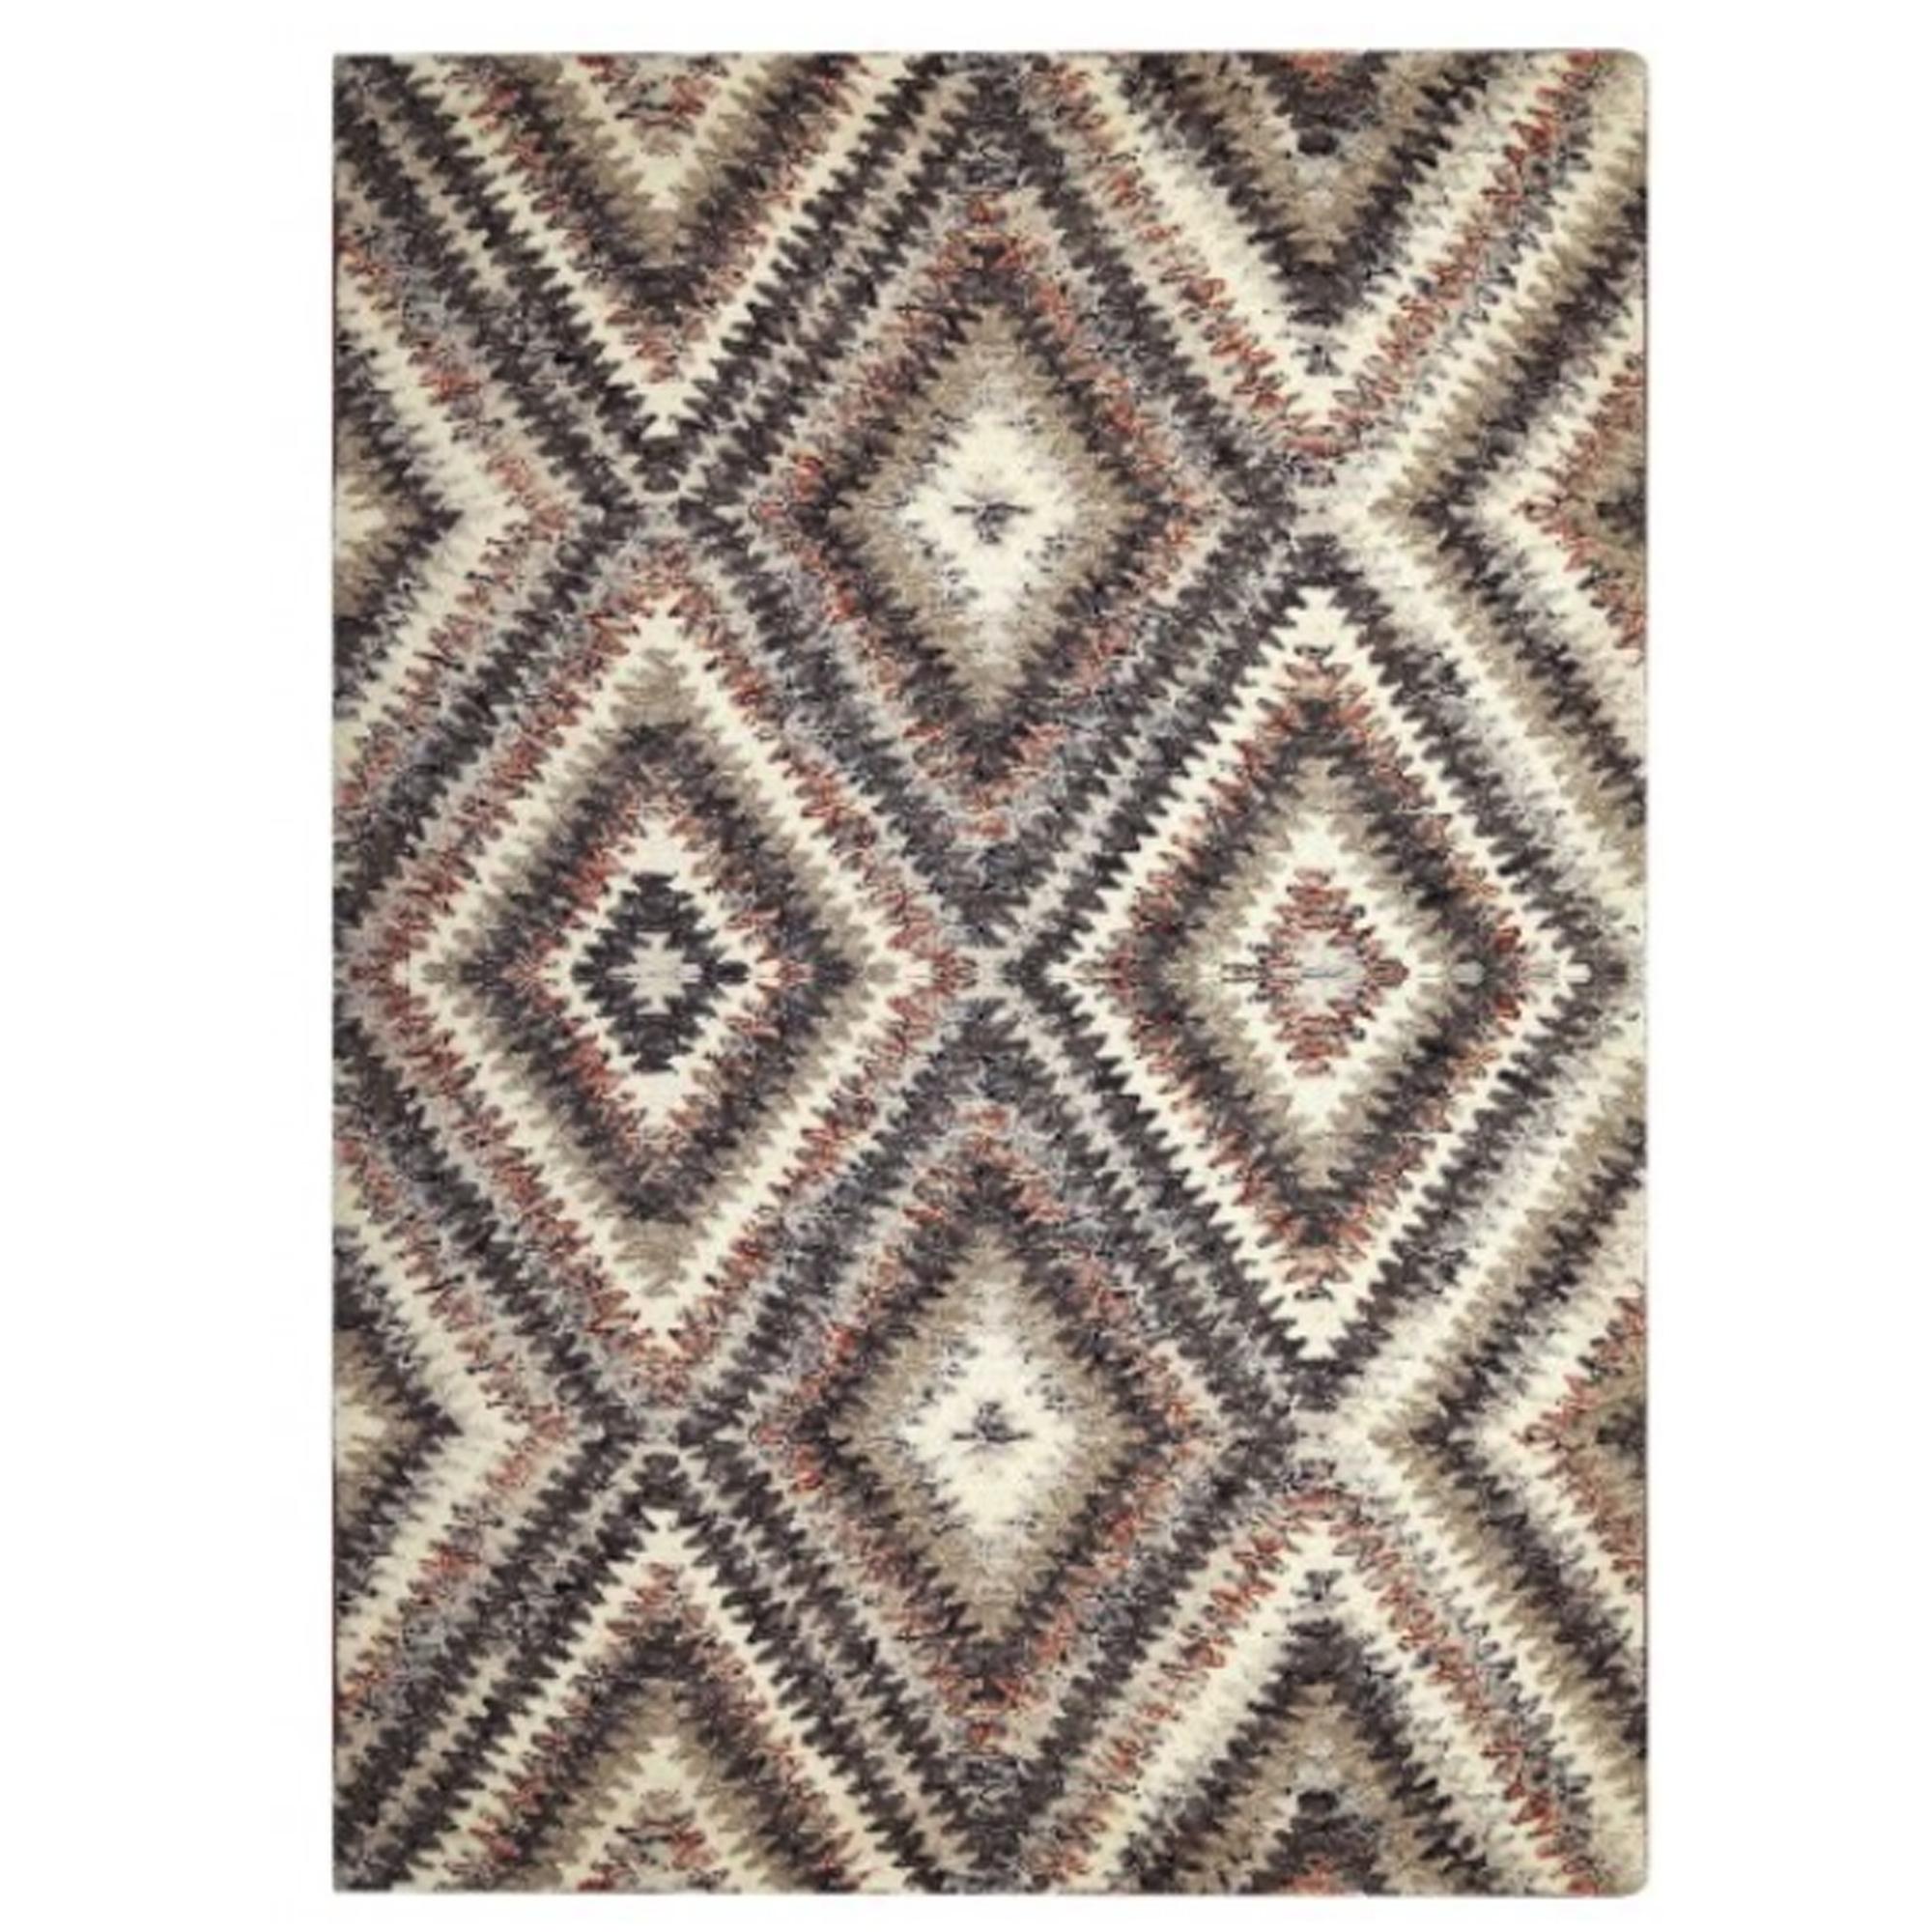 x oriental wool vintage persian peno decor runner rug home carpet bohemian p rugs long hallway orange fullxfull red il